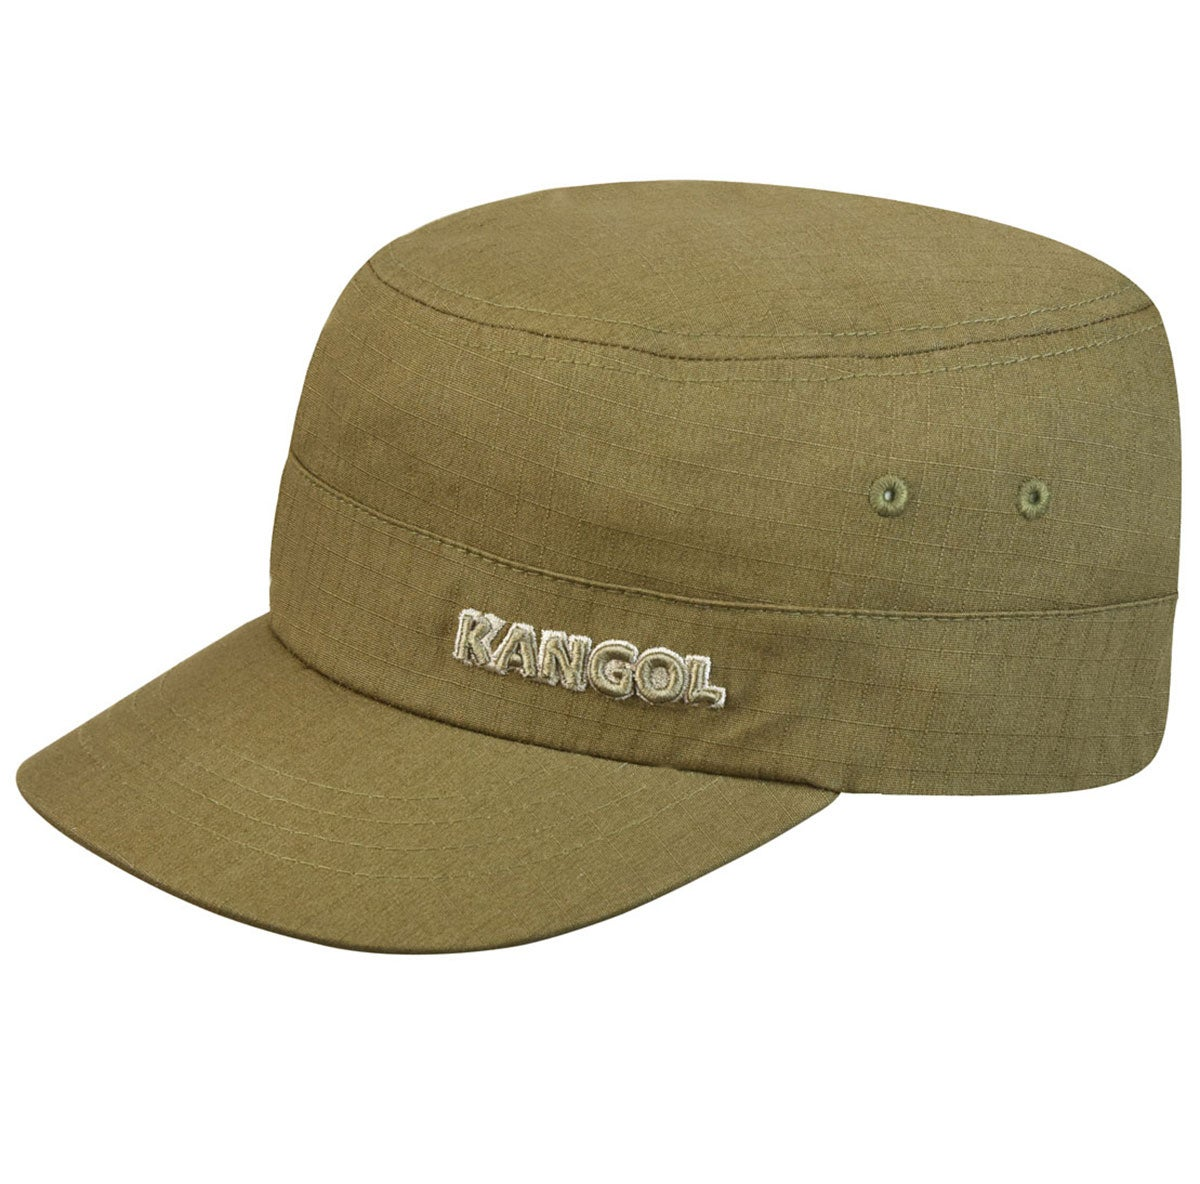 Kangol Ripstop Army Cap in Green